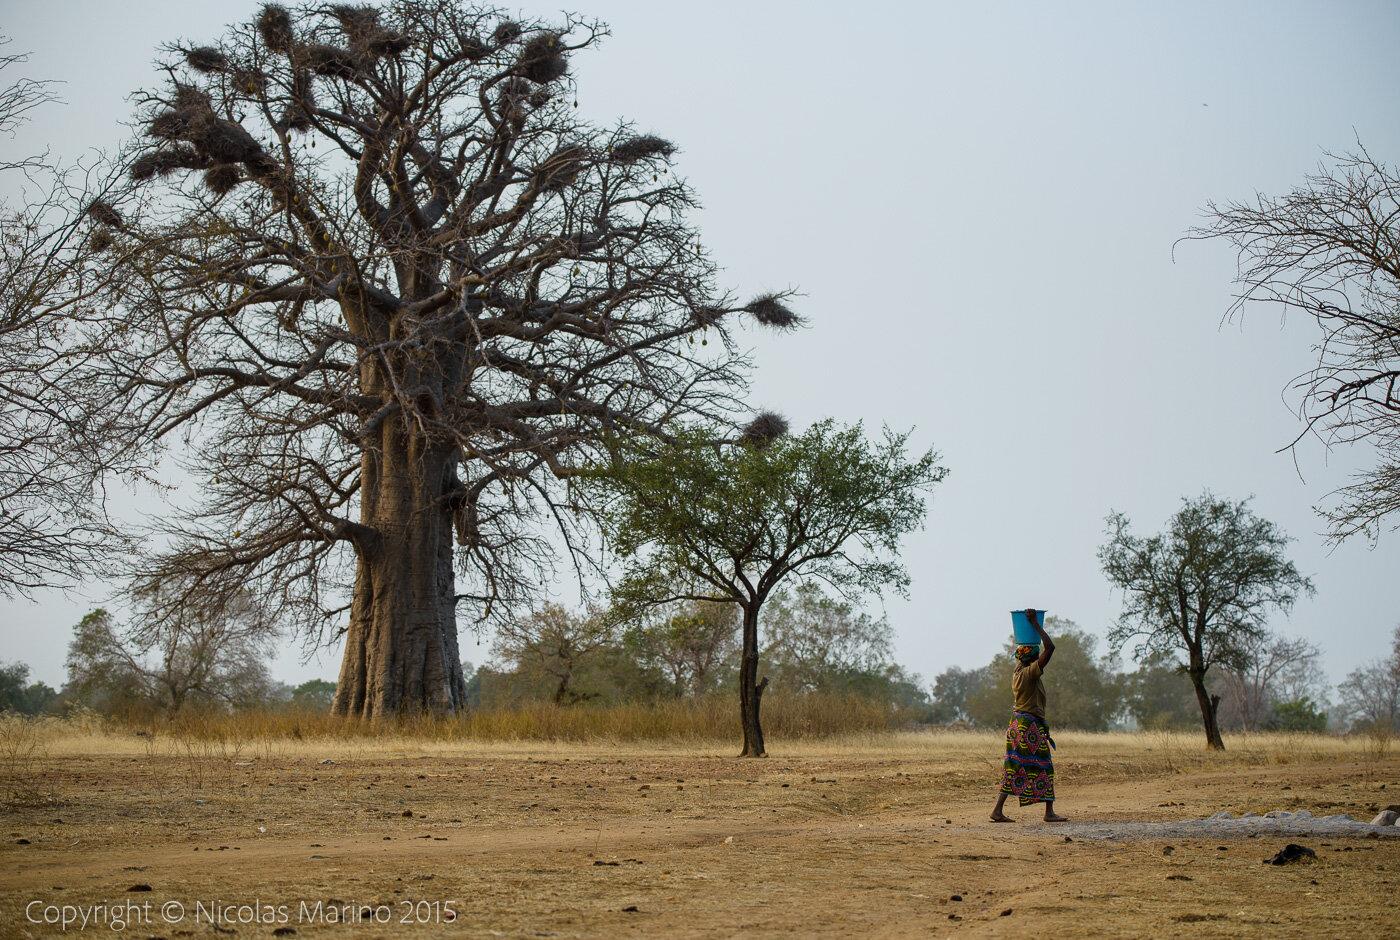 Rural life in Burkina Faso